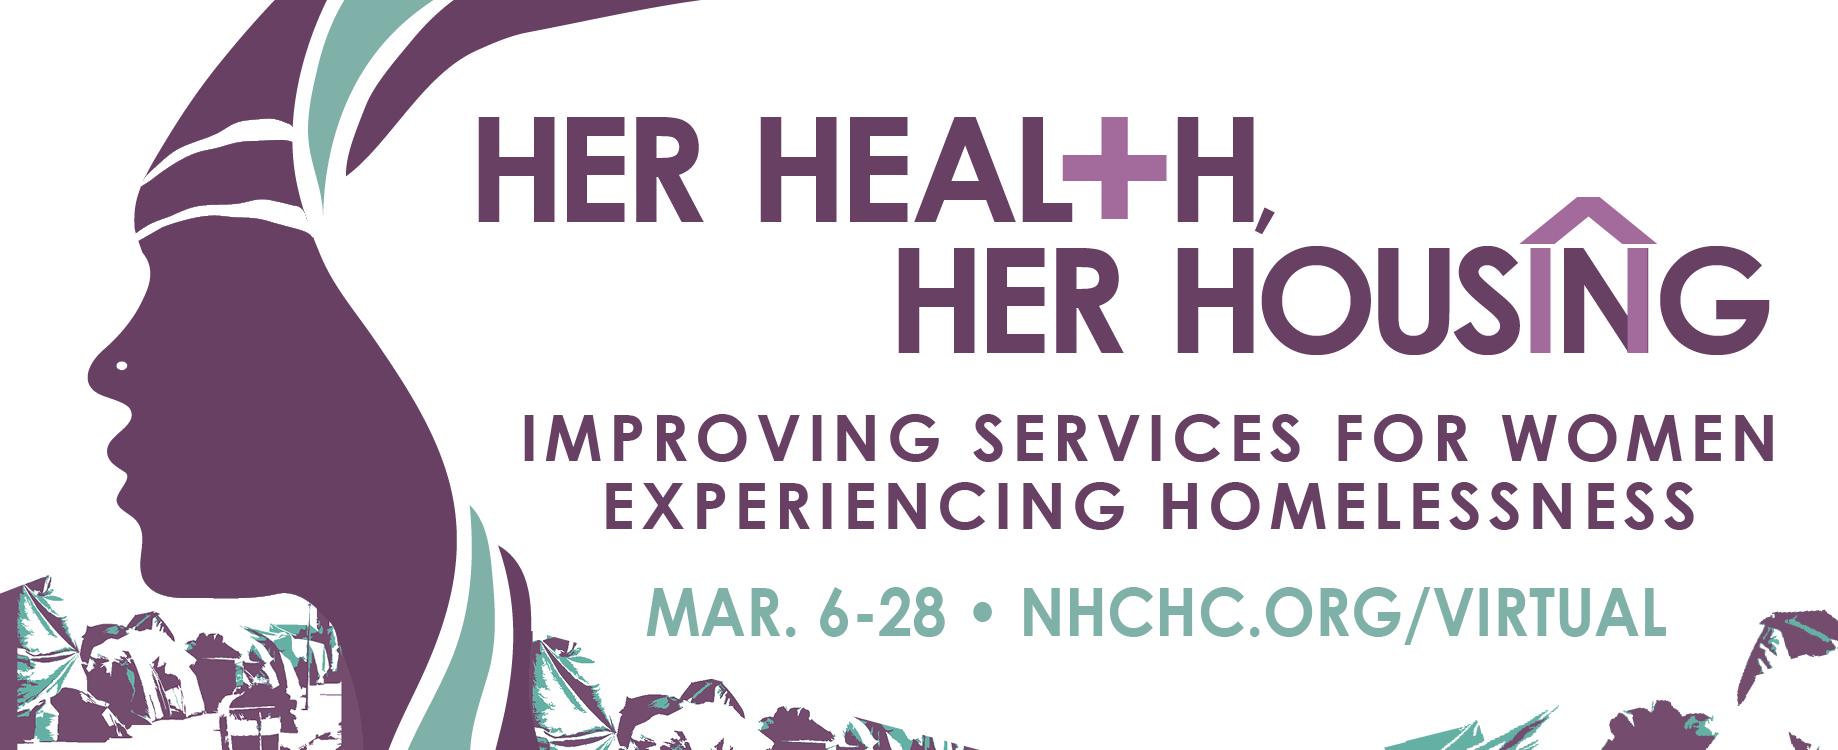 Her Health, Her Housing